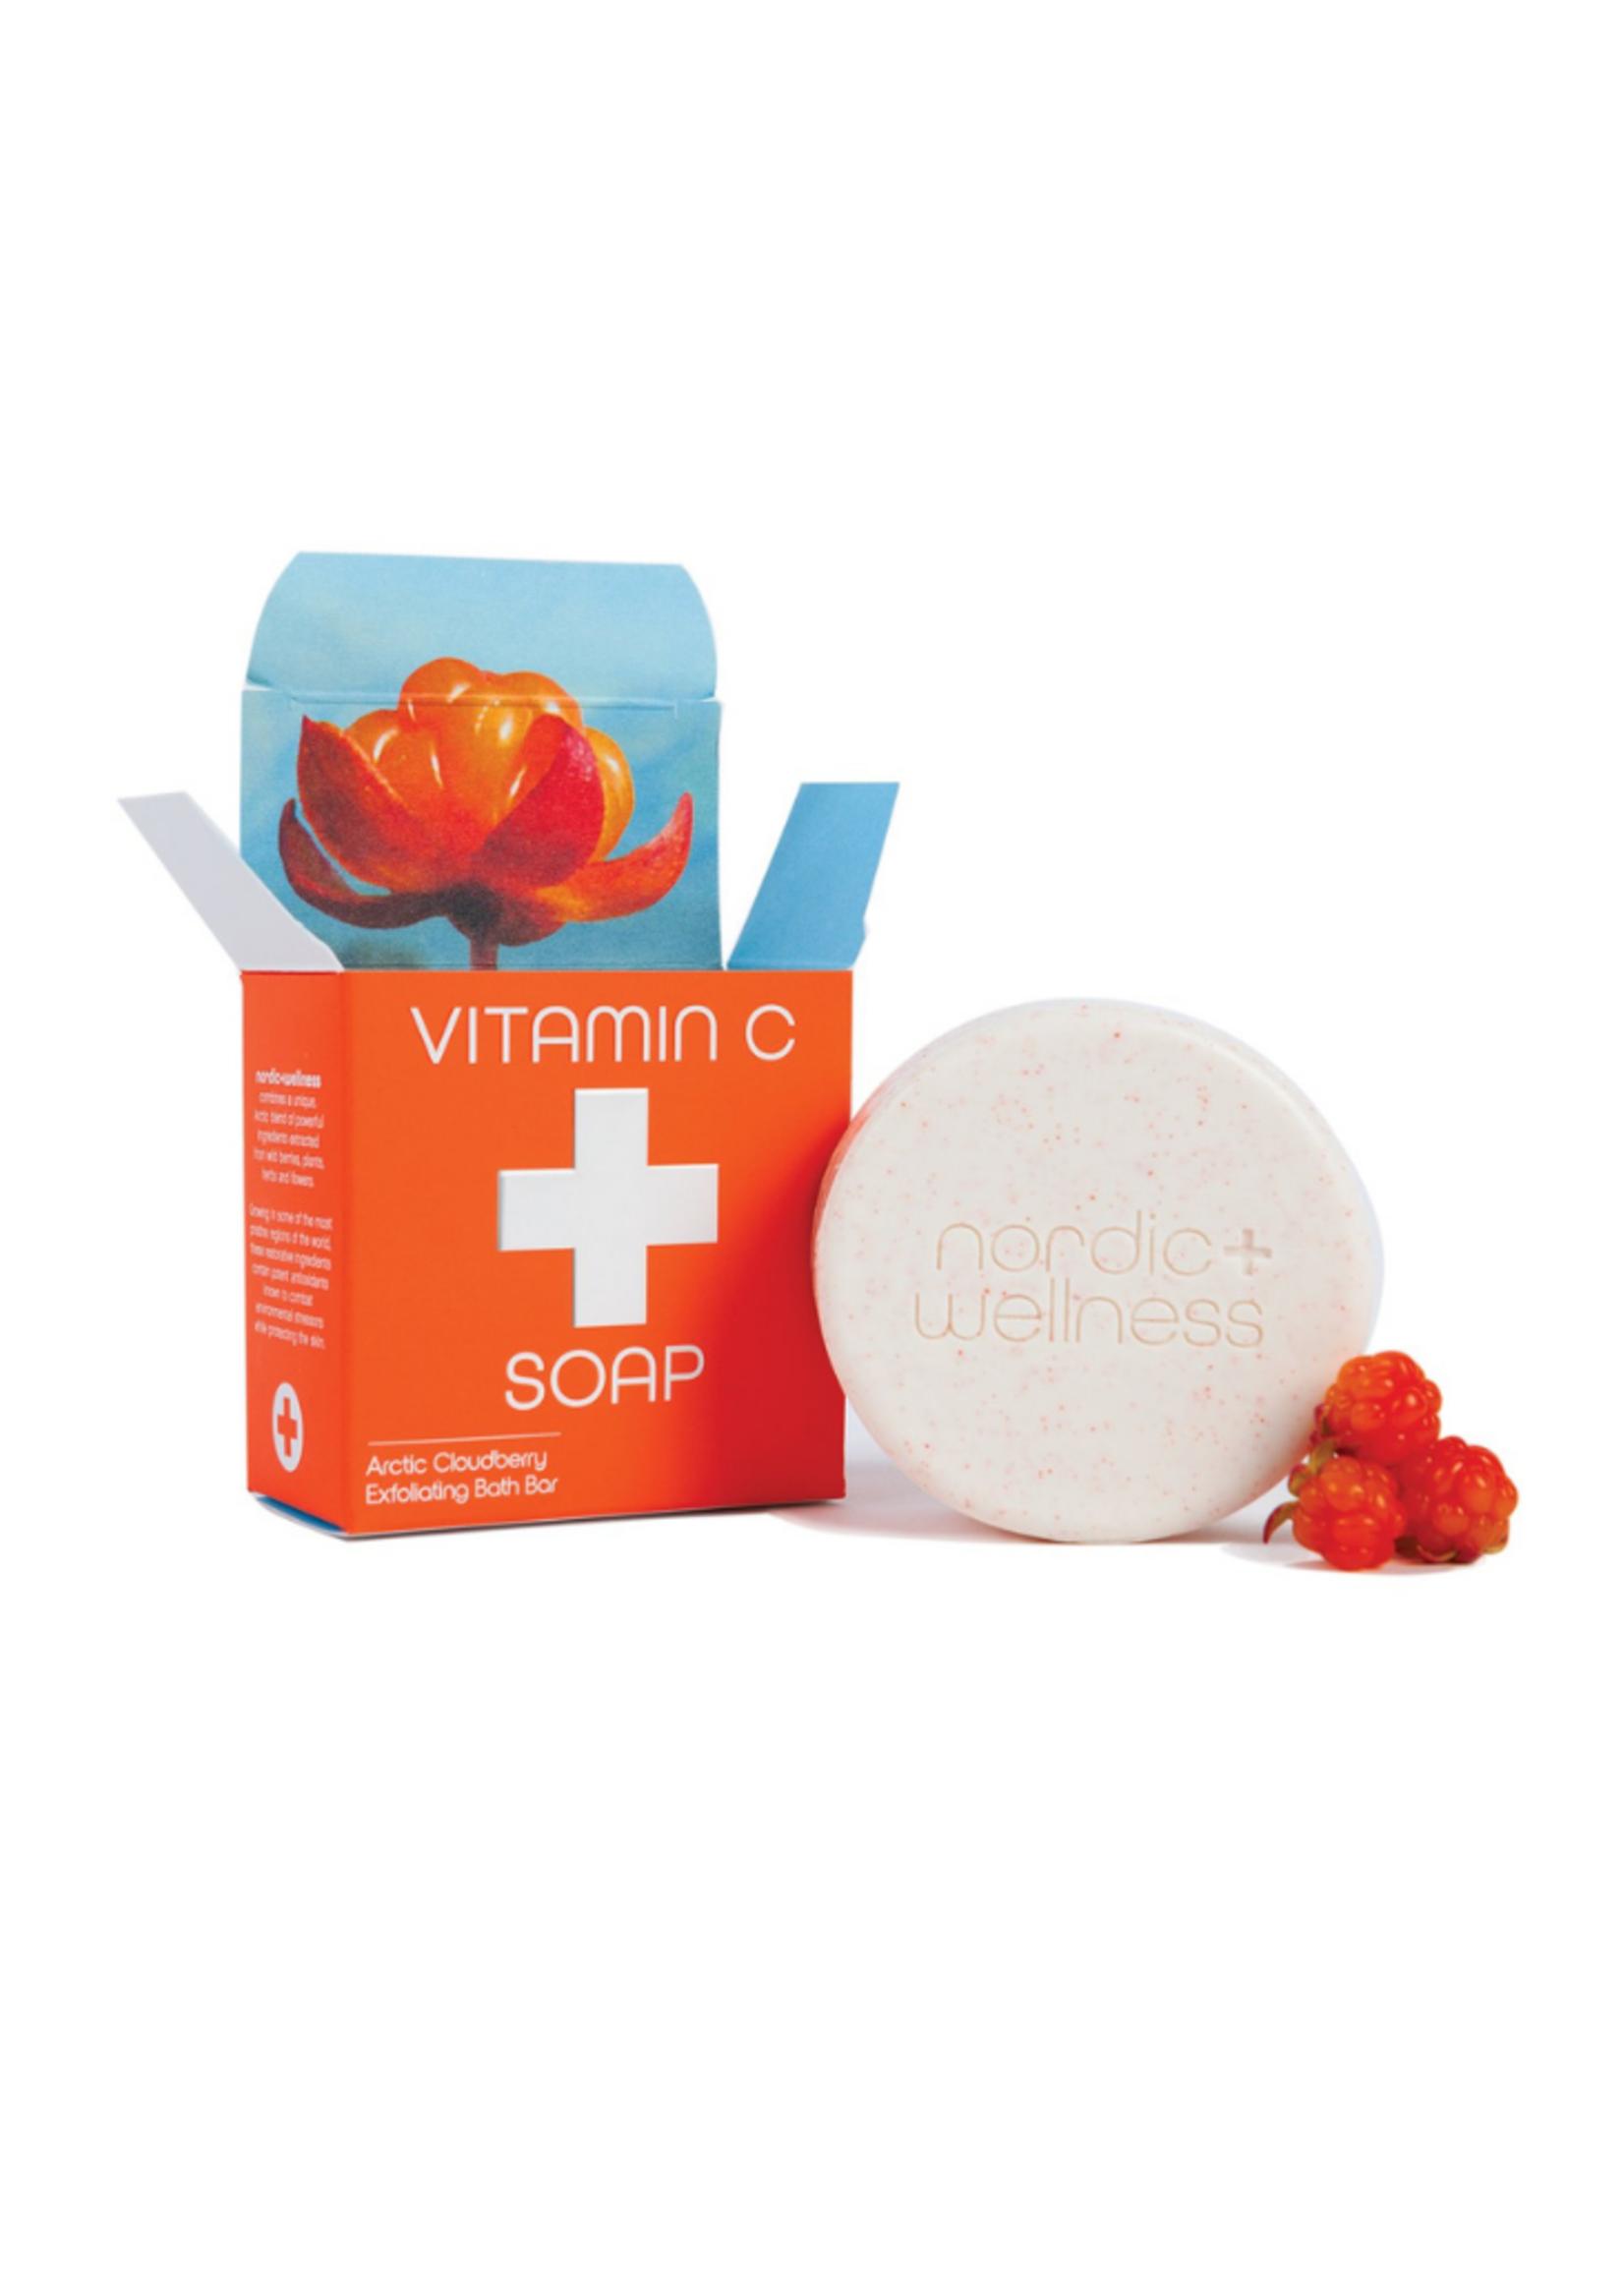 Kala Nordic + Wellness Vitamin C Soap